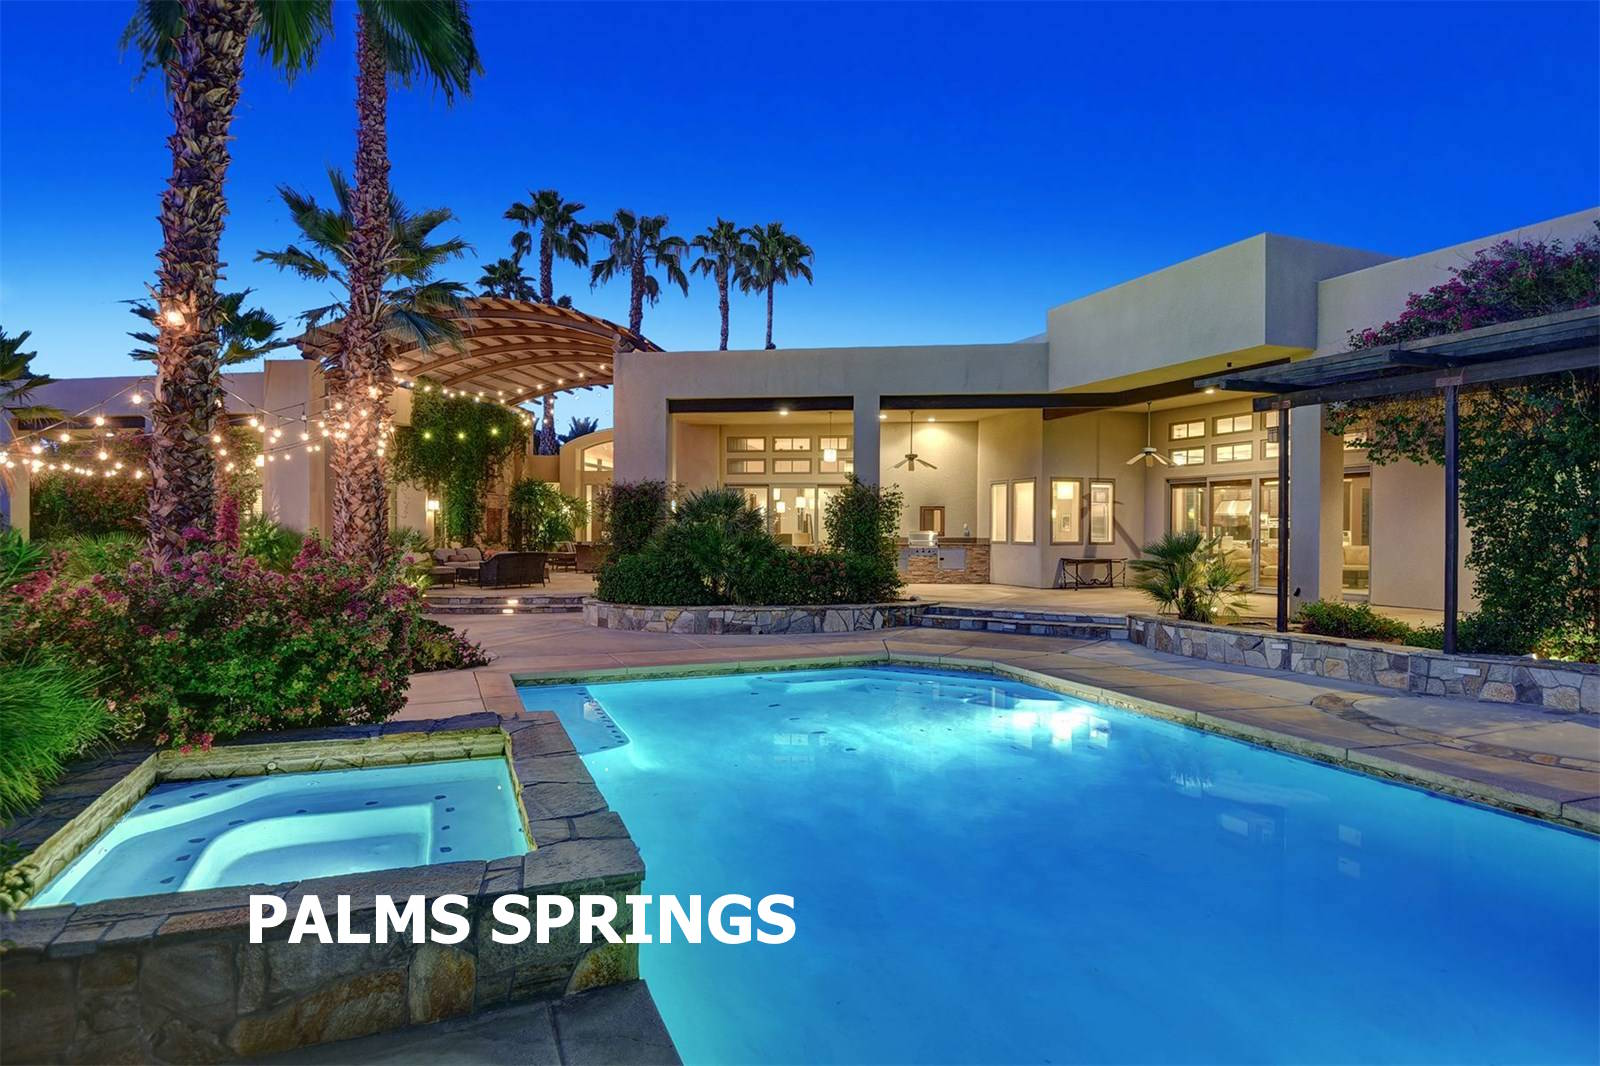 Palm Springs california, Rancho Mirage, La Quntas, Keller Hotels Luxury Vacation Rentals.jpeg